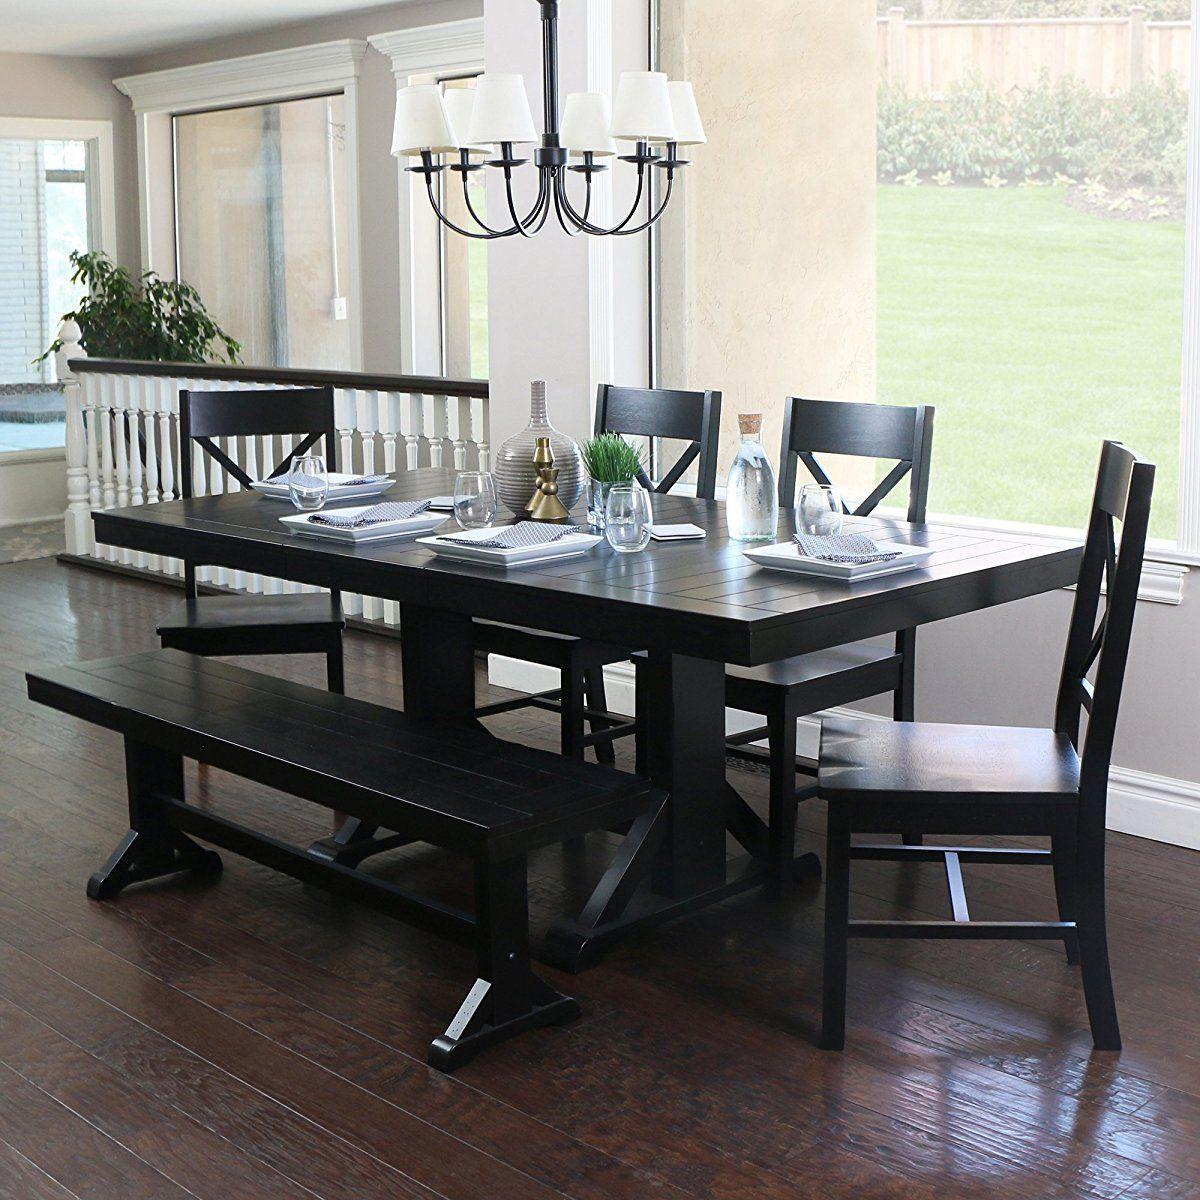 We Furniture 6 Piece Black Solid Wood Dining Set Black Dining Room Table Black Dining Room Dining Table Black